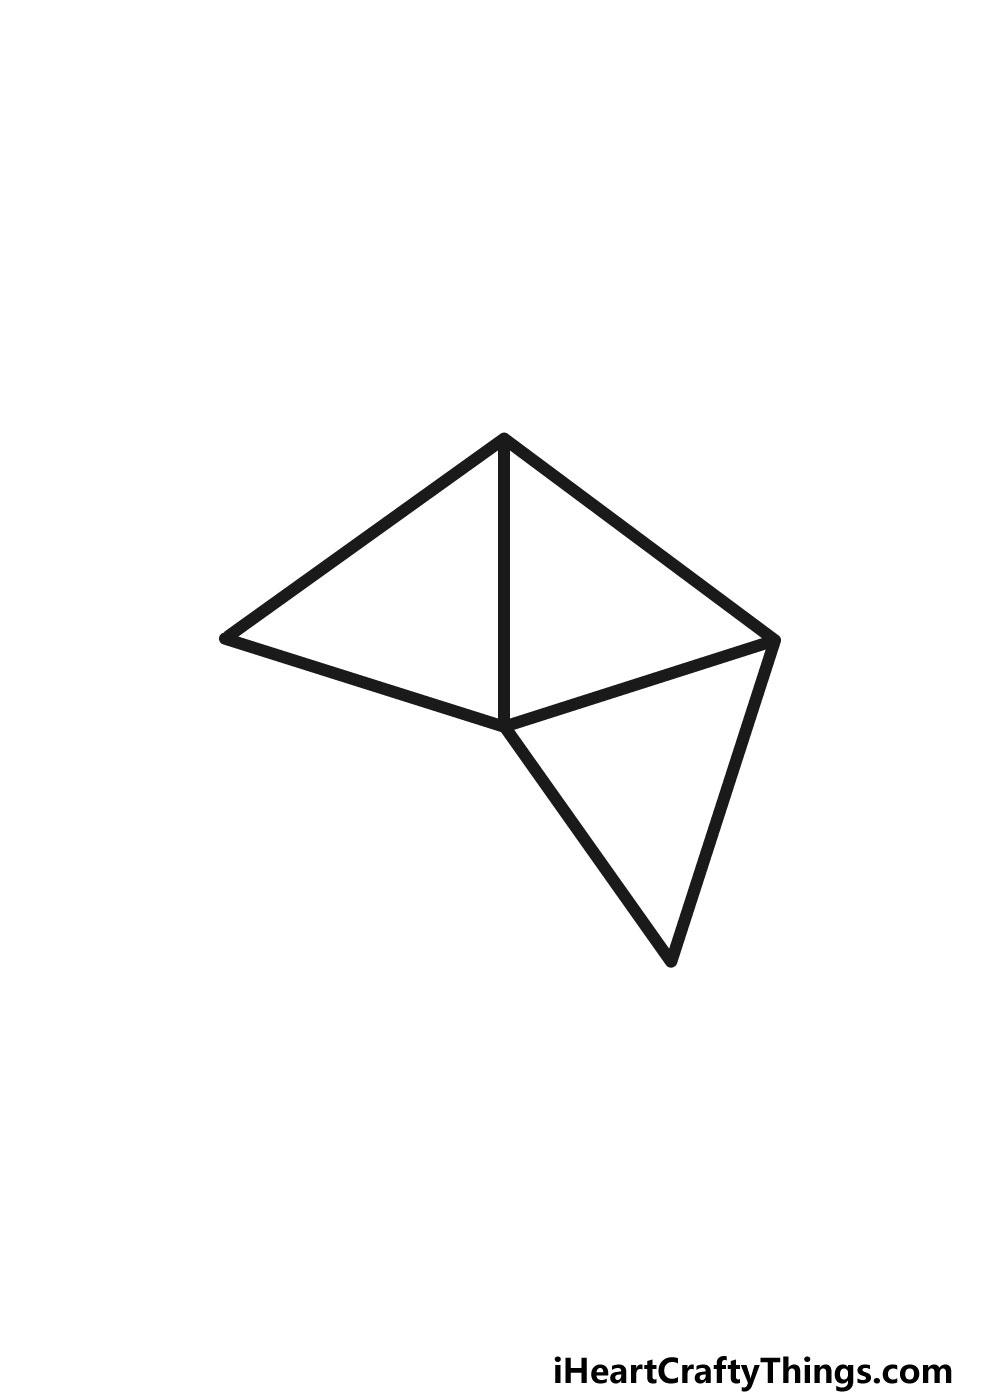 drawing a pentagon step 3